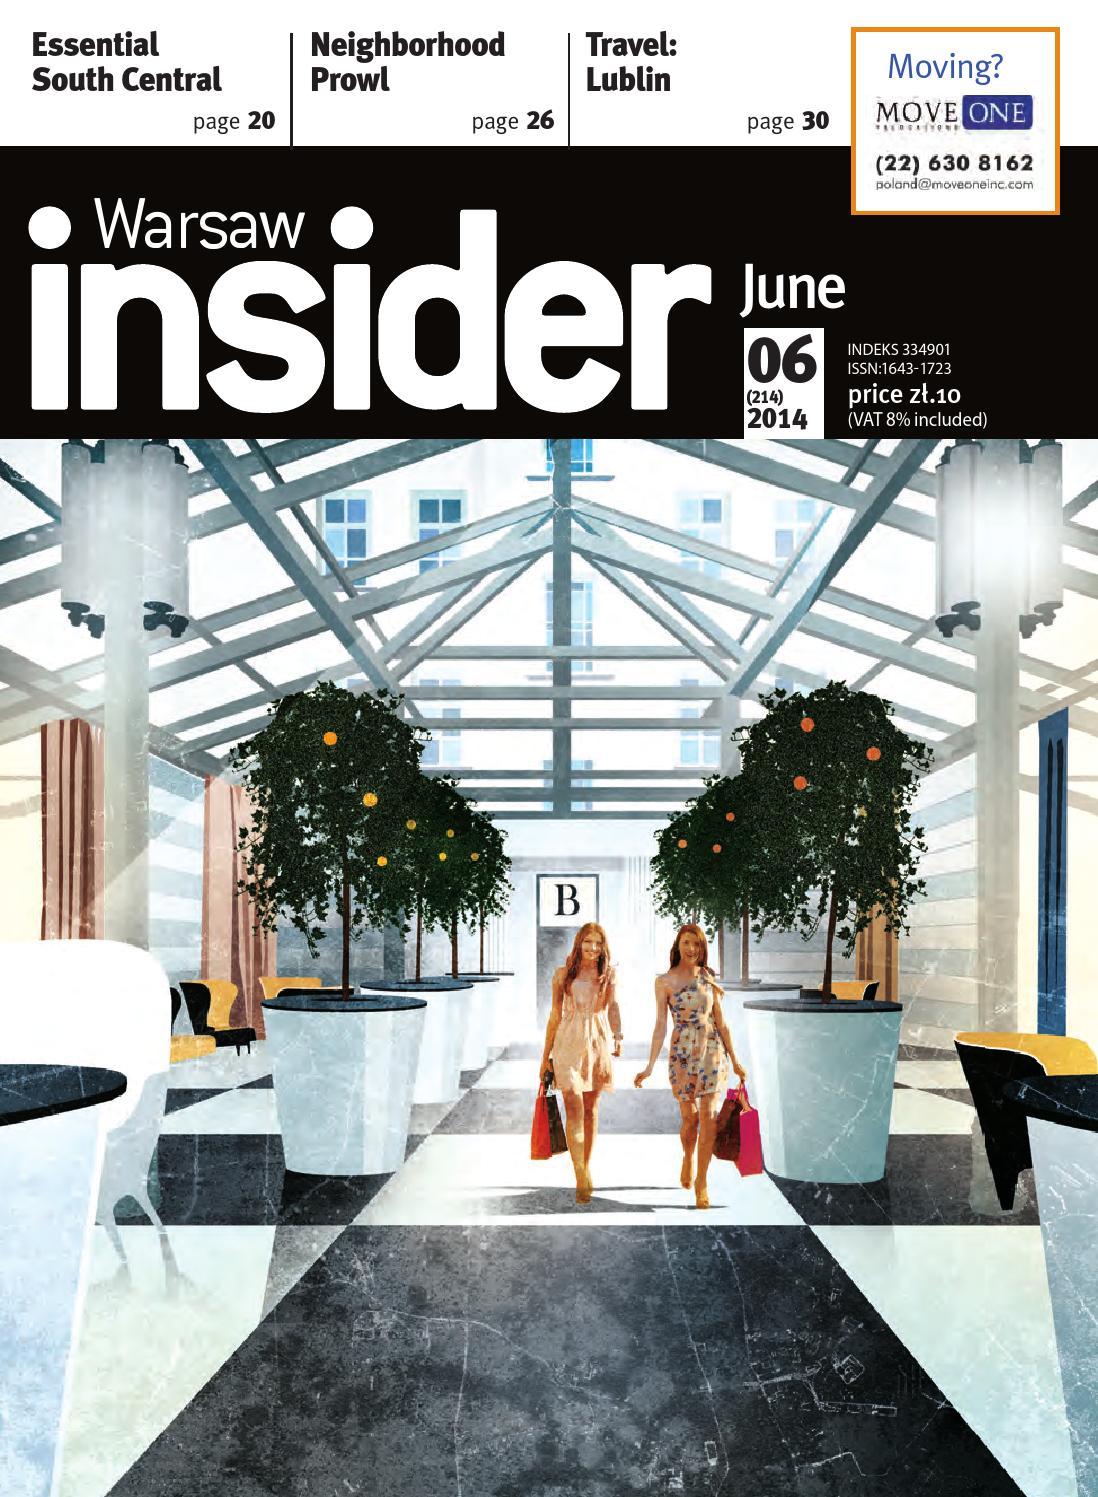 Warsaw Insider June 2014 # 214 by Valkea Media Pro - issuu